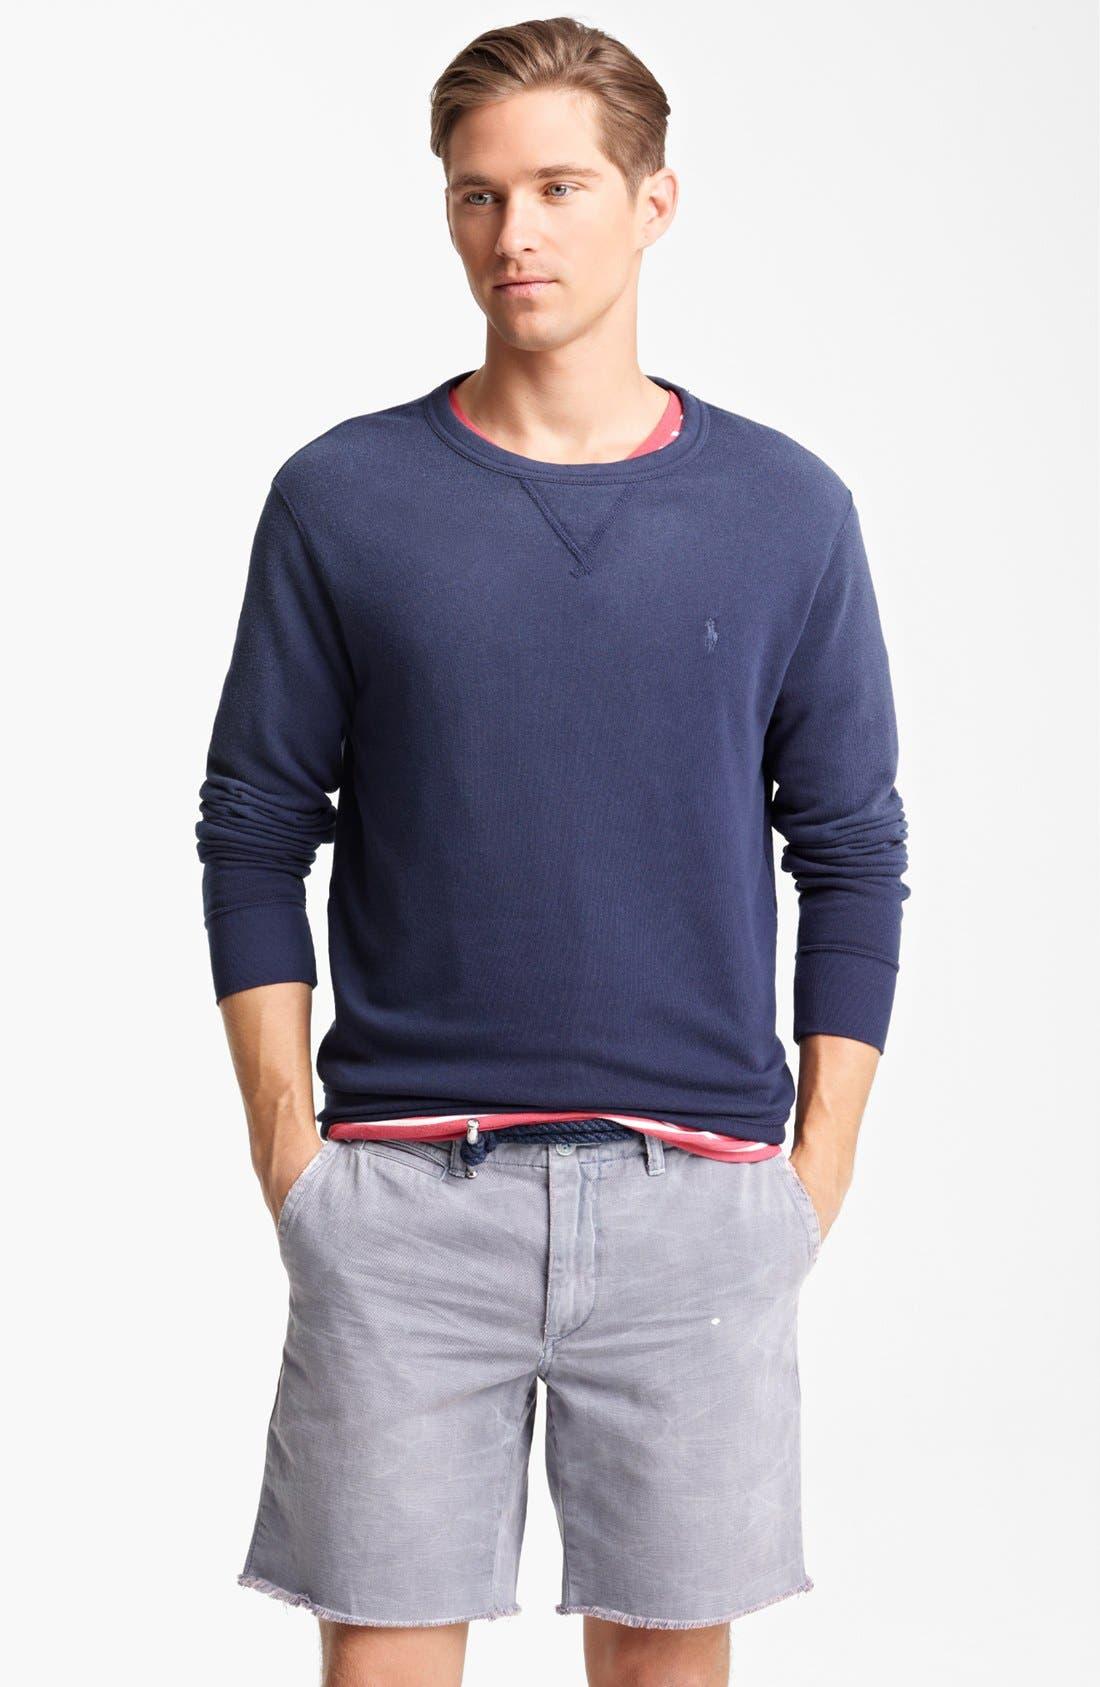 Alternate Image 1 Selected - Polo Ralph Lauren Sweat Shirt